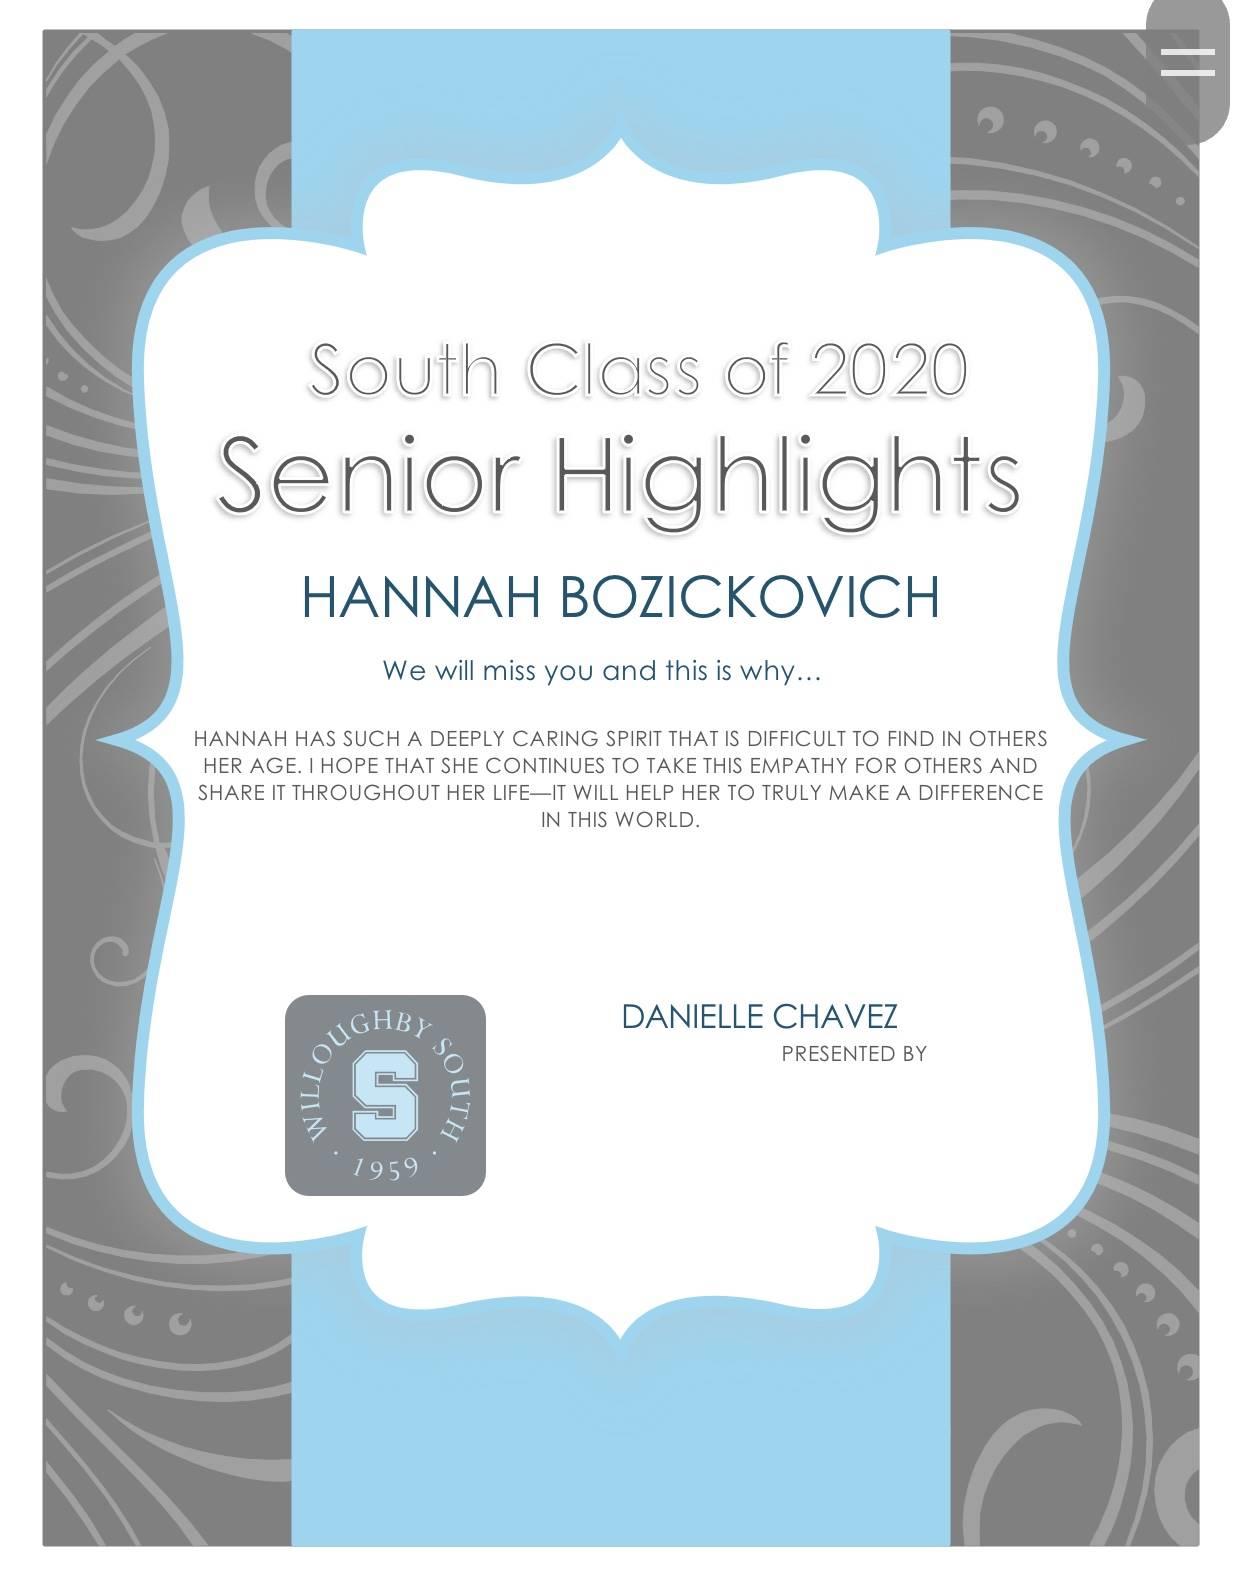 Hannah Bozickovich